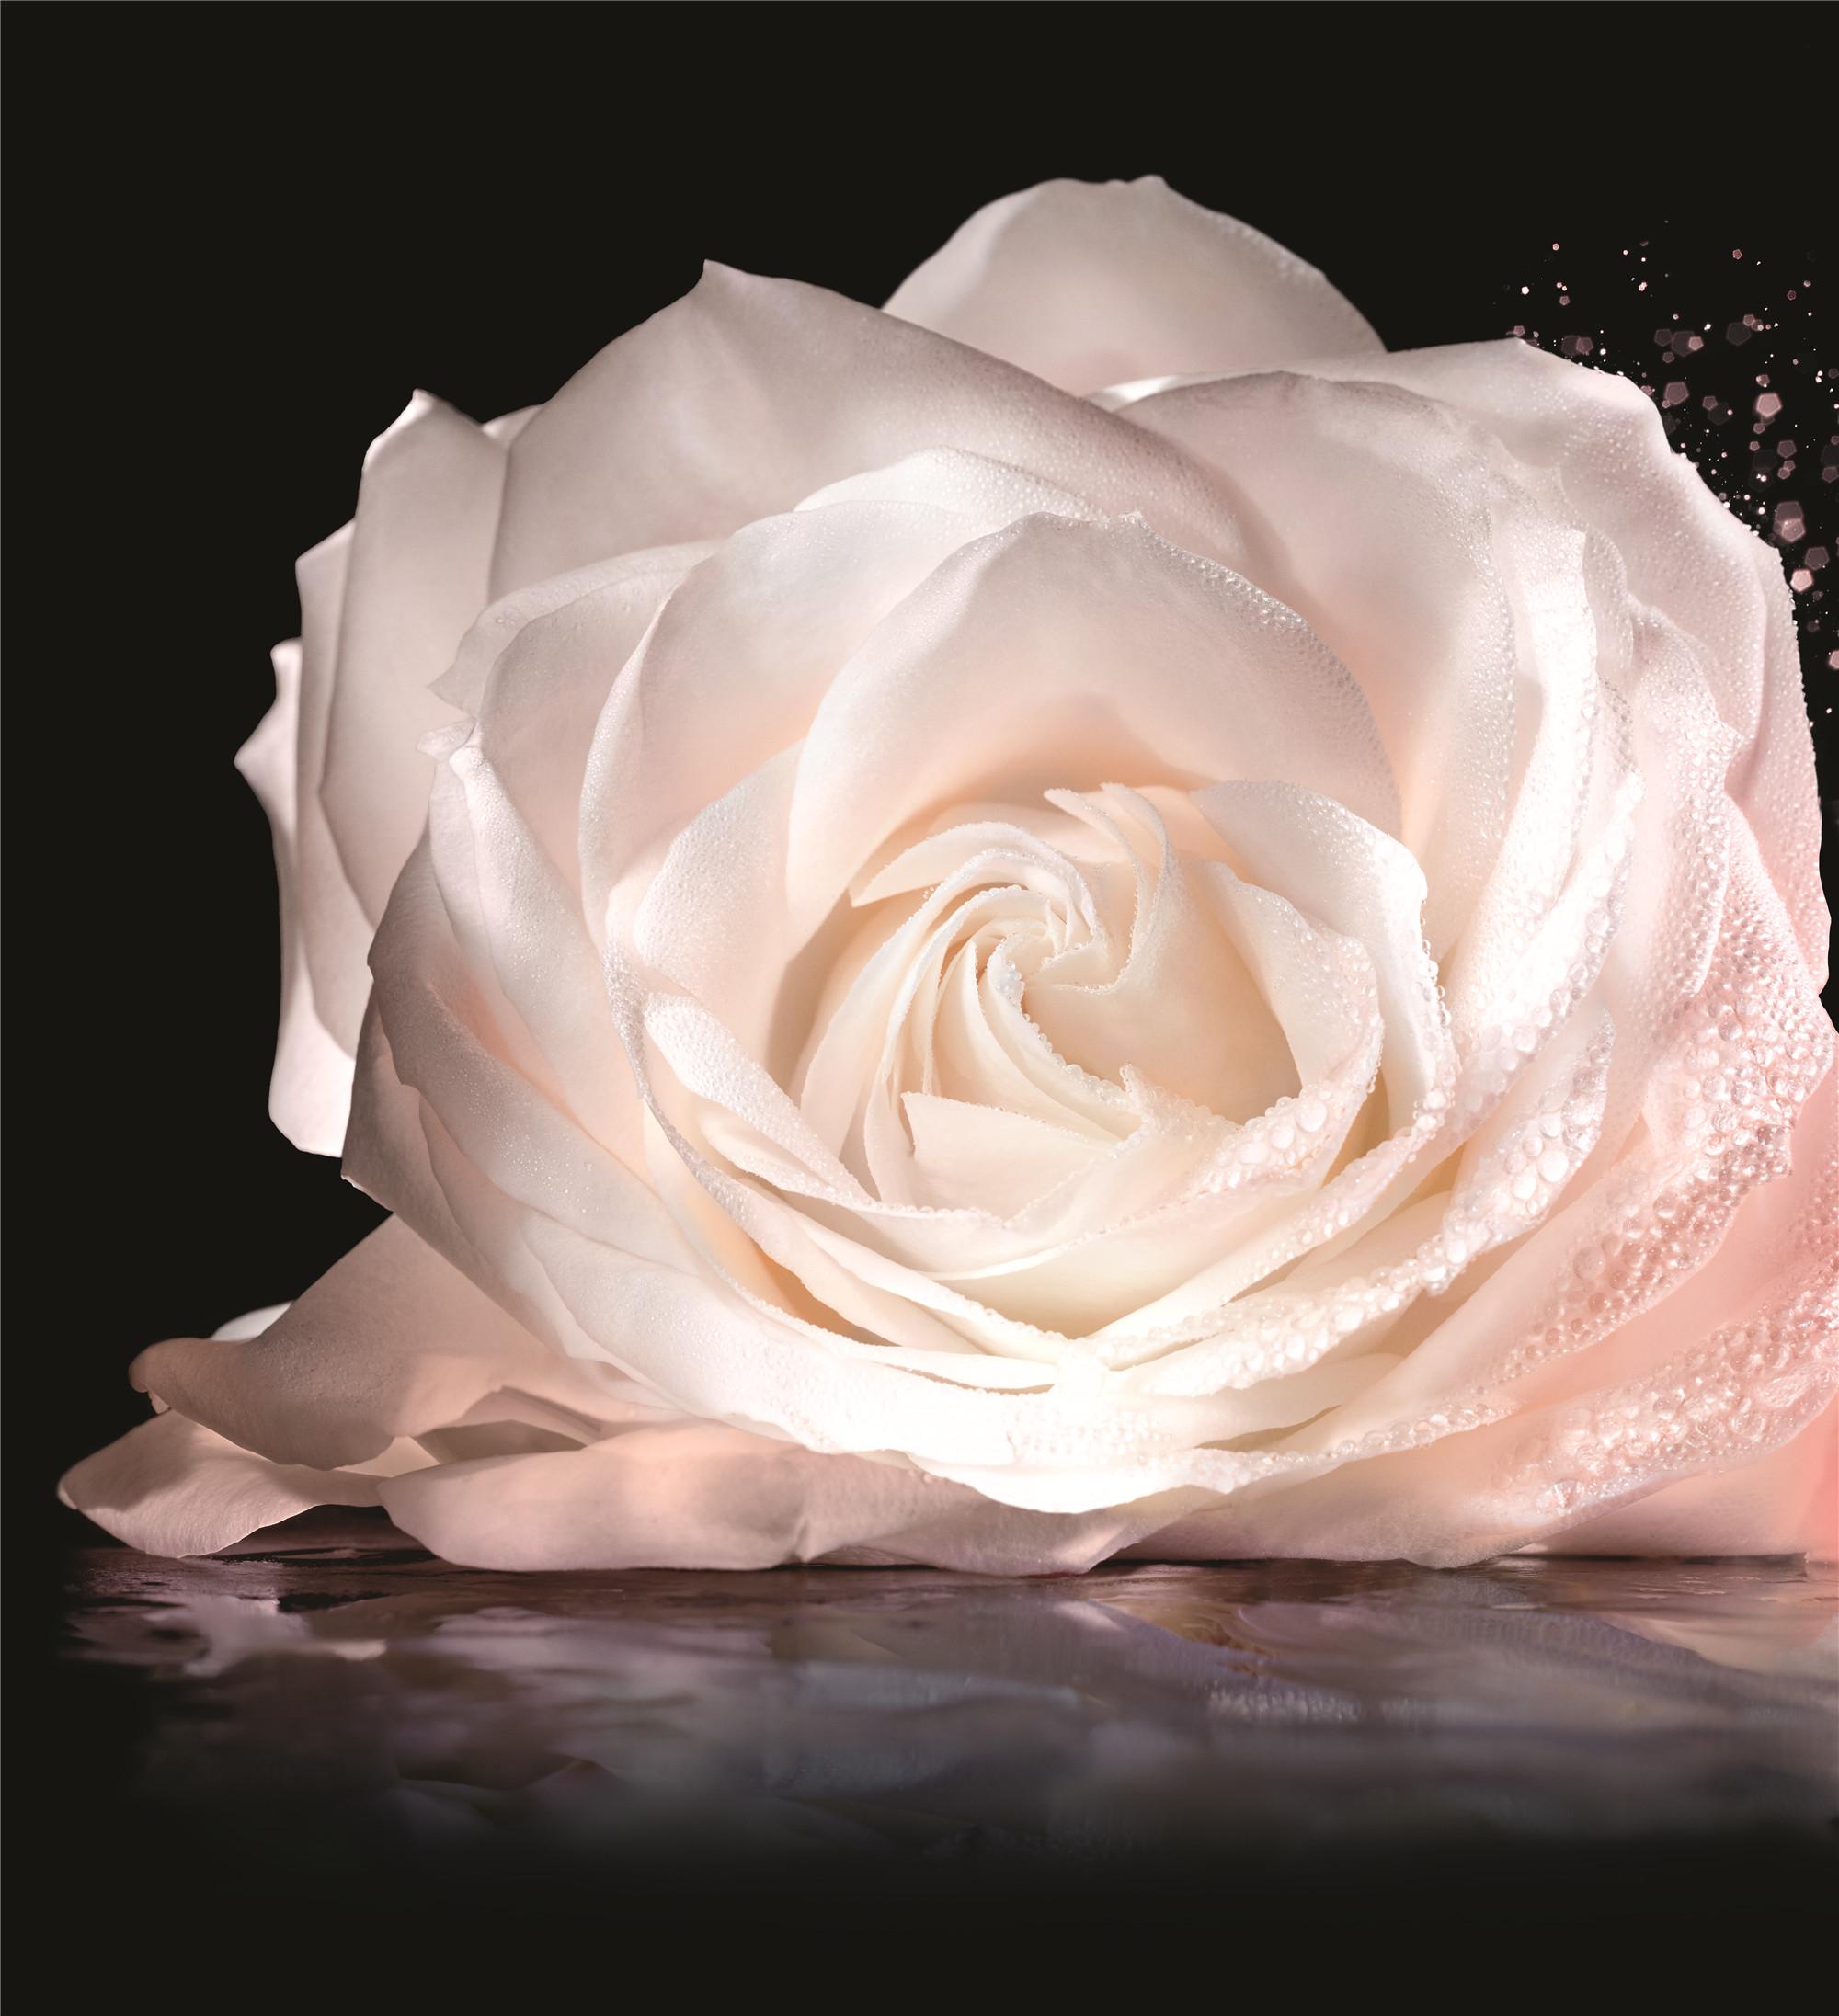 S342_PrestigeHuile_18_03_Main_Rose_Crop_F39.jpg